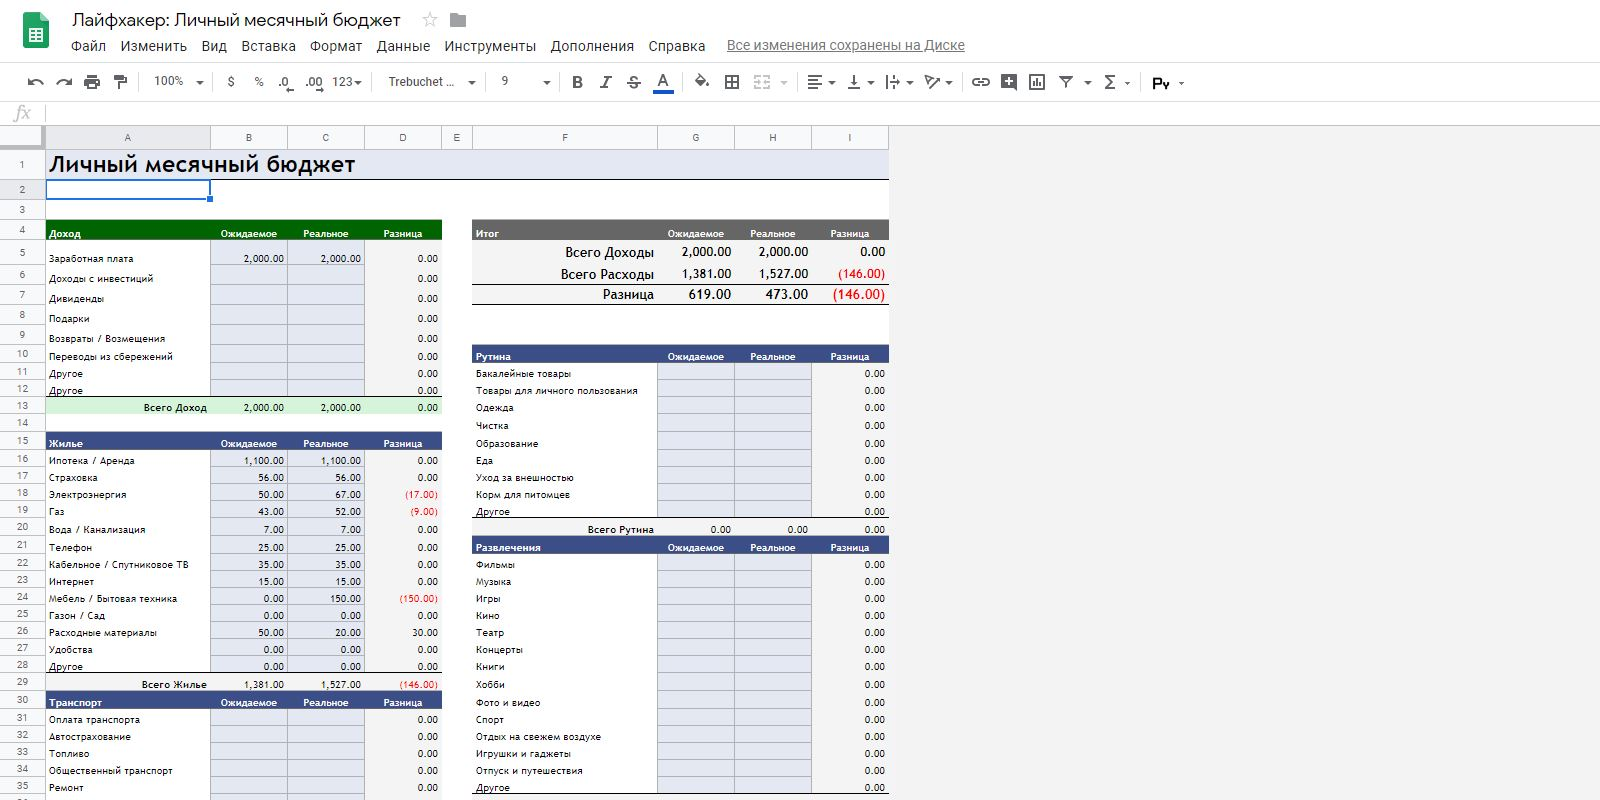 «Google Таблицы»: шаблон «Личный и семейный бюджет»